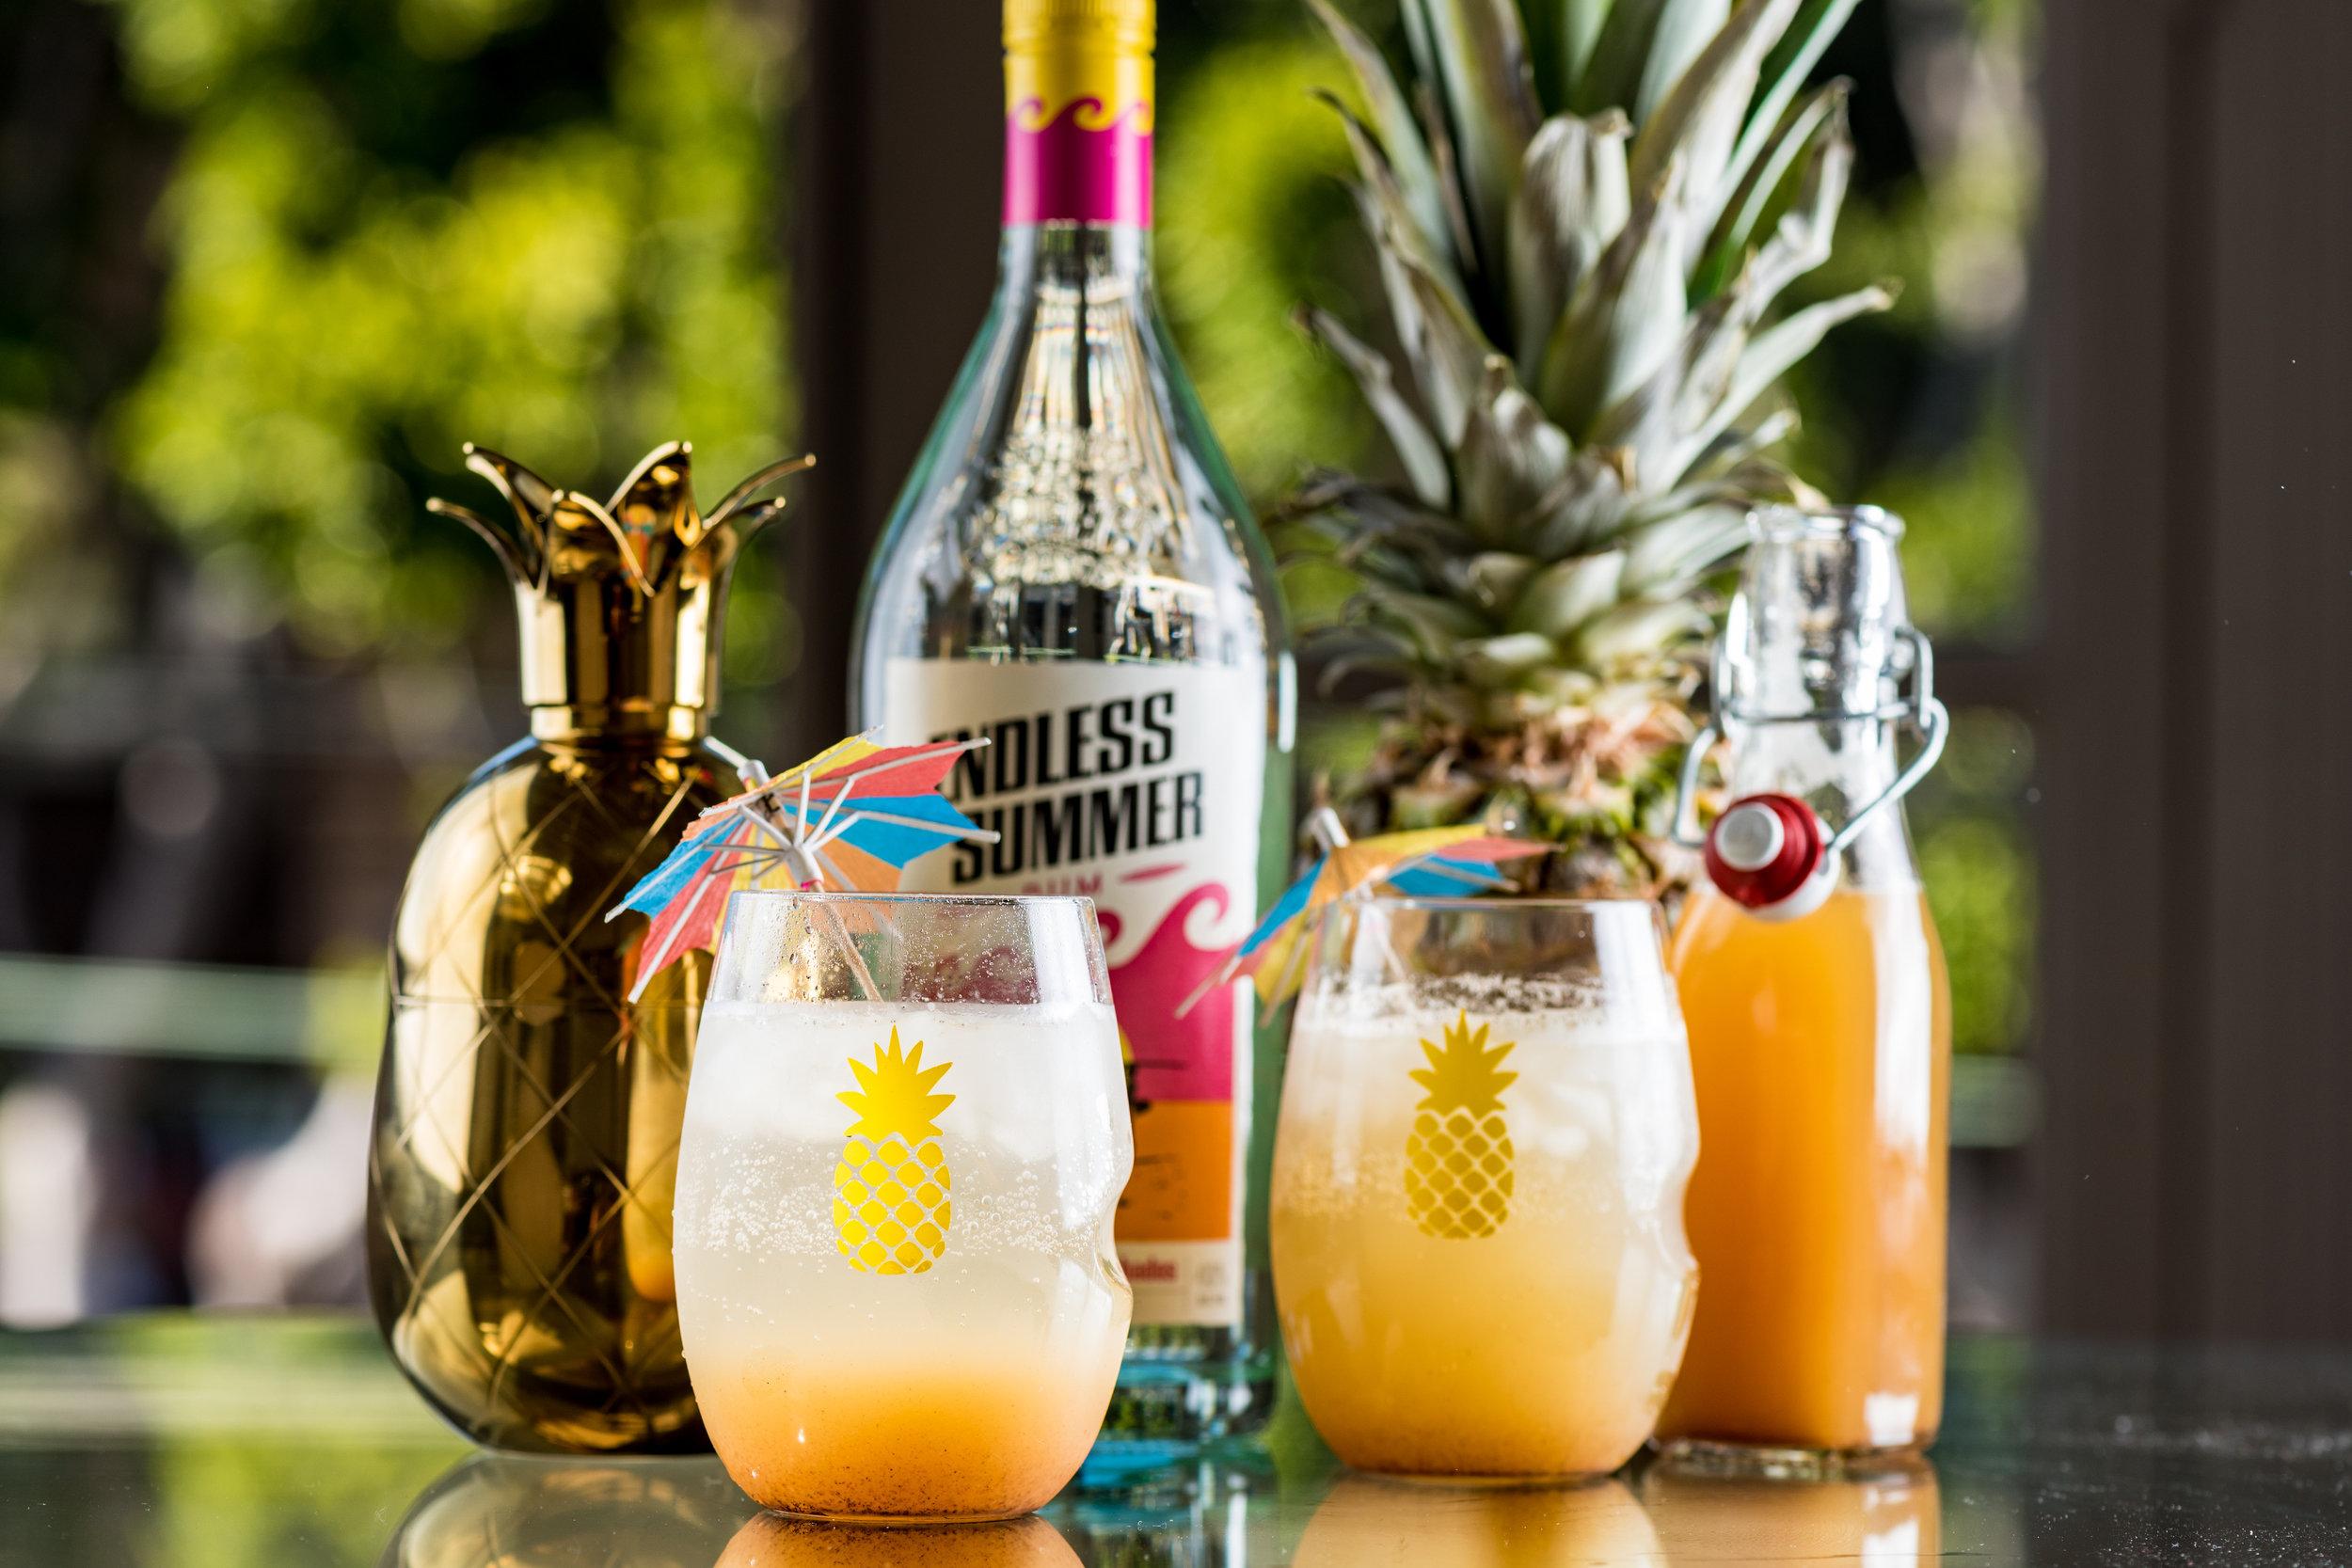 Pineapple Shrub & Caribbean Pineapple-Rum Spritz